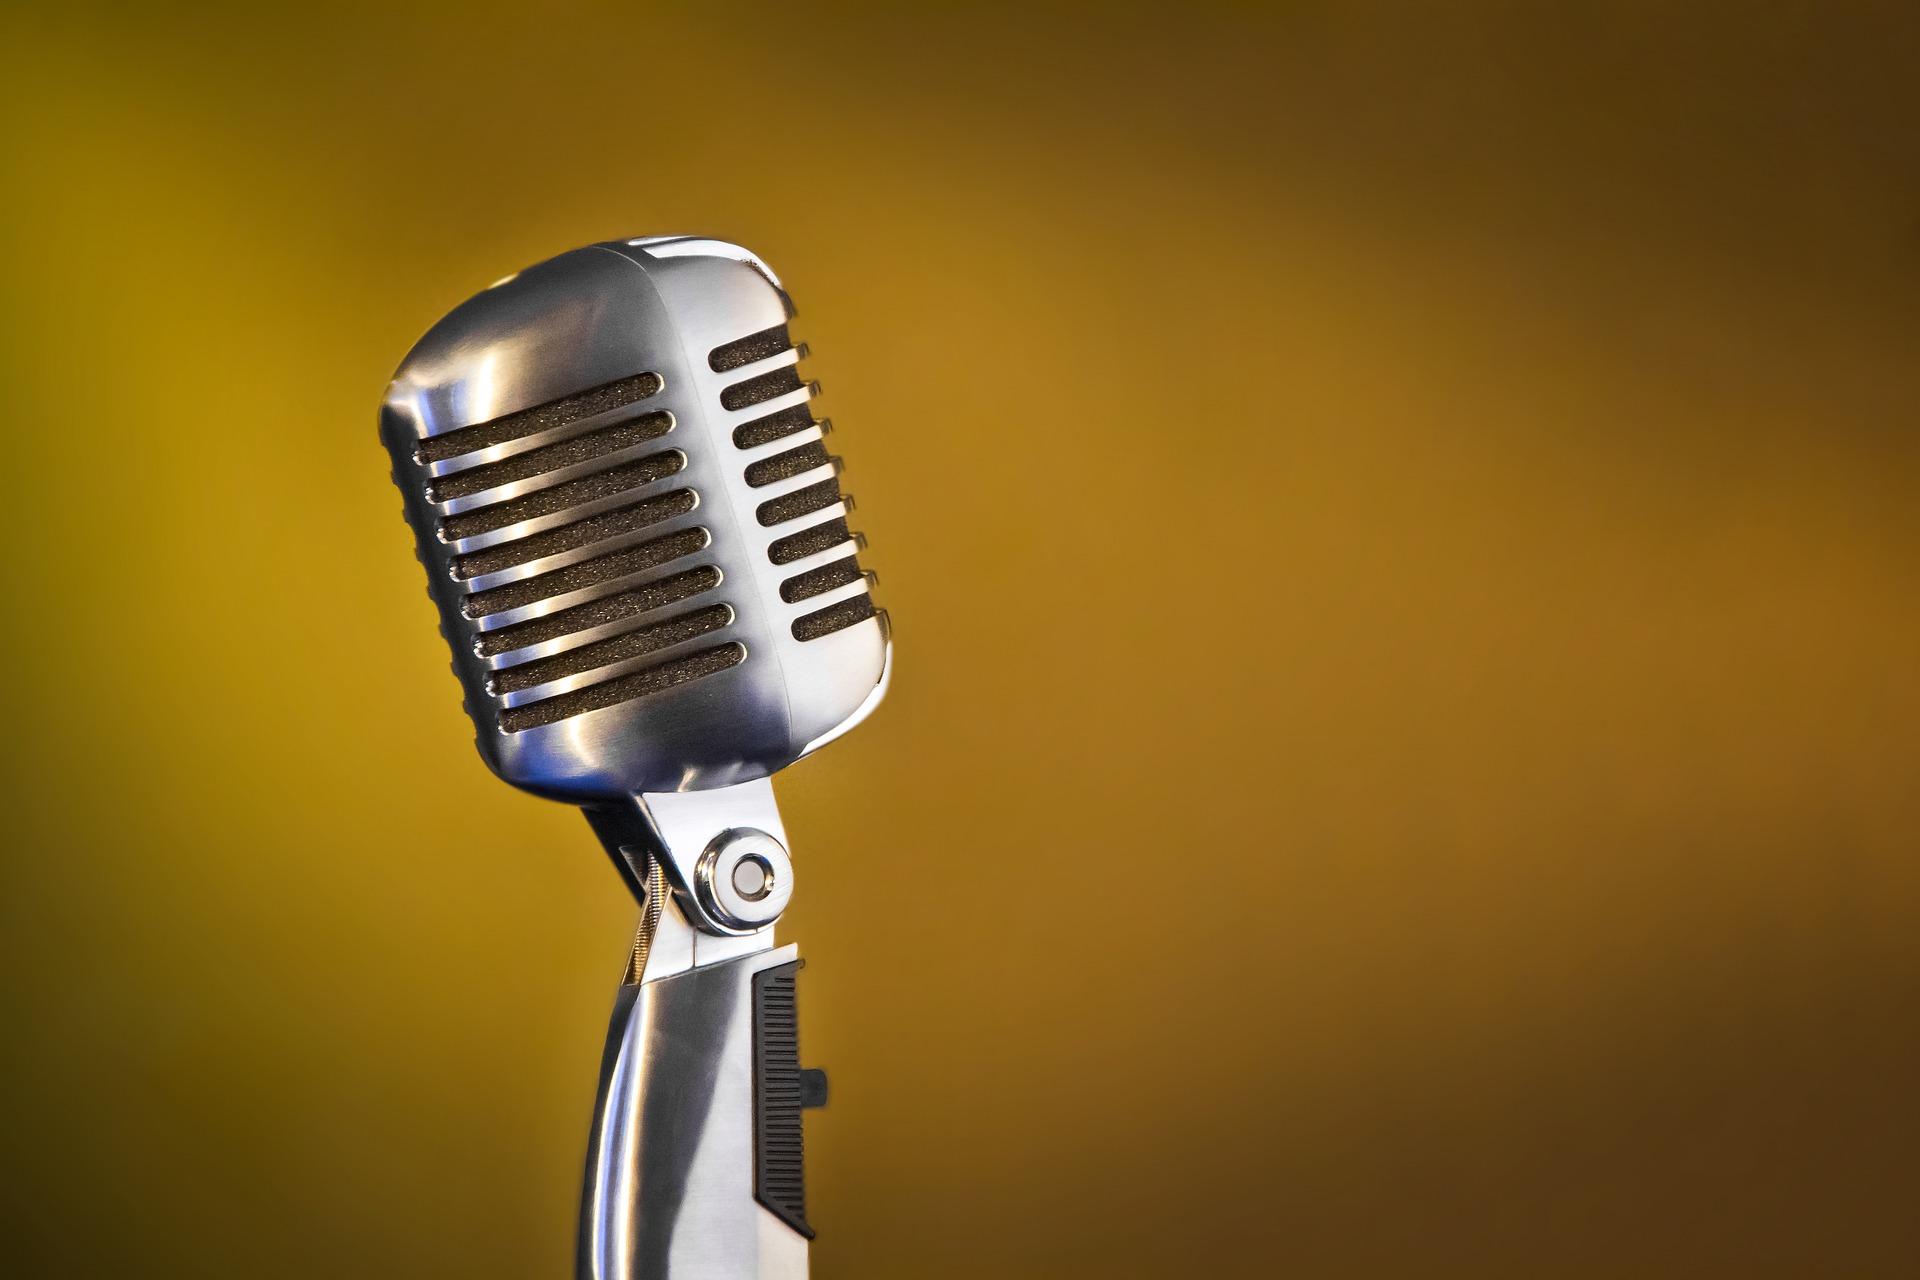 microphone-1977718_1920